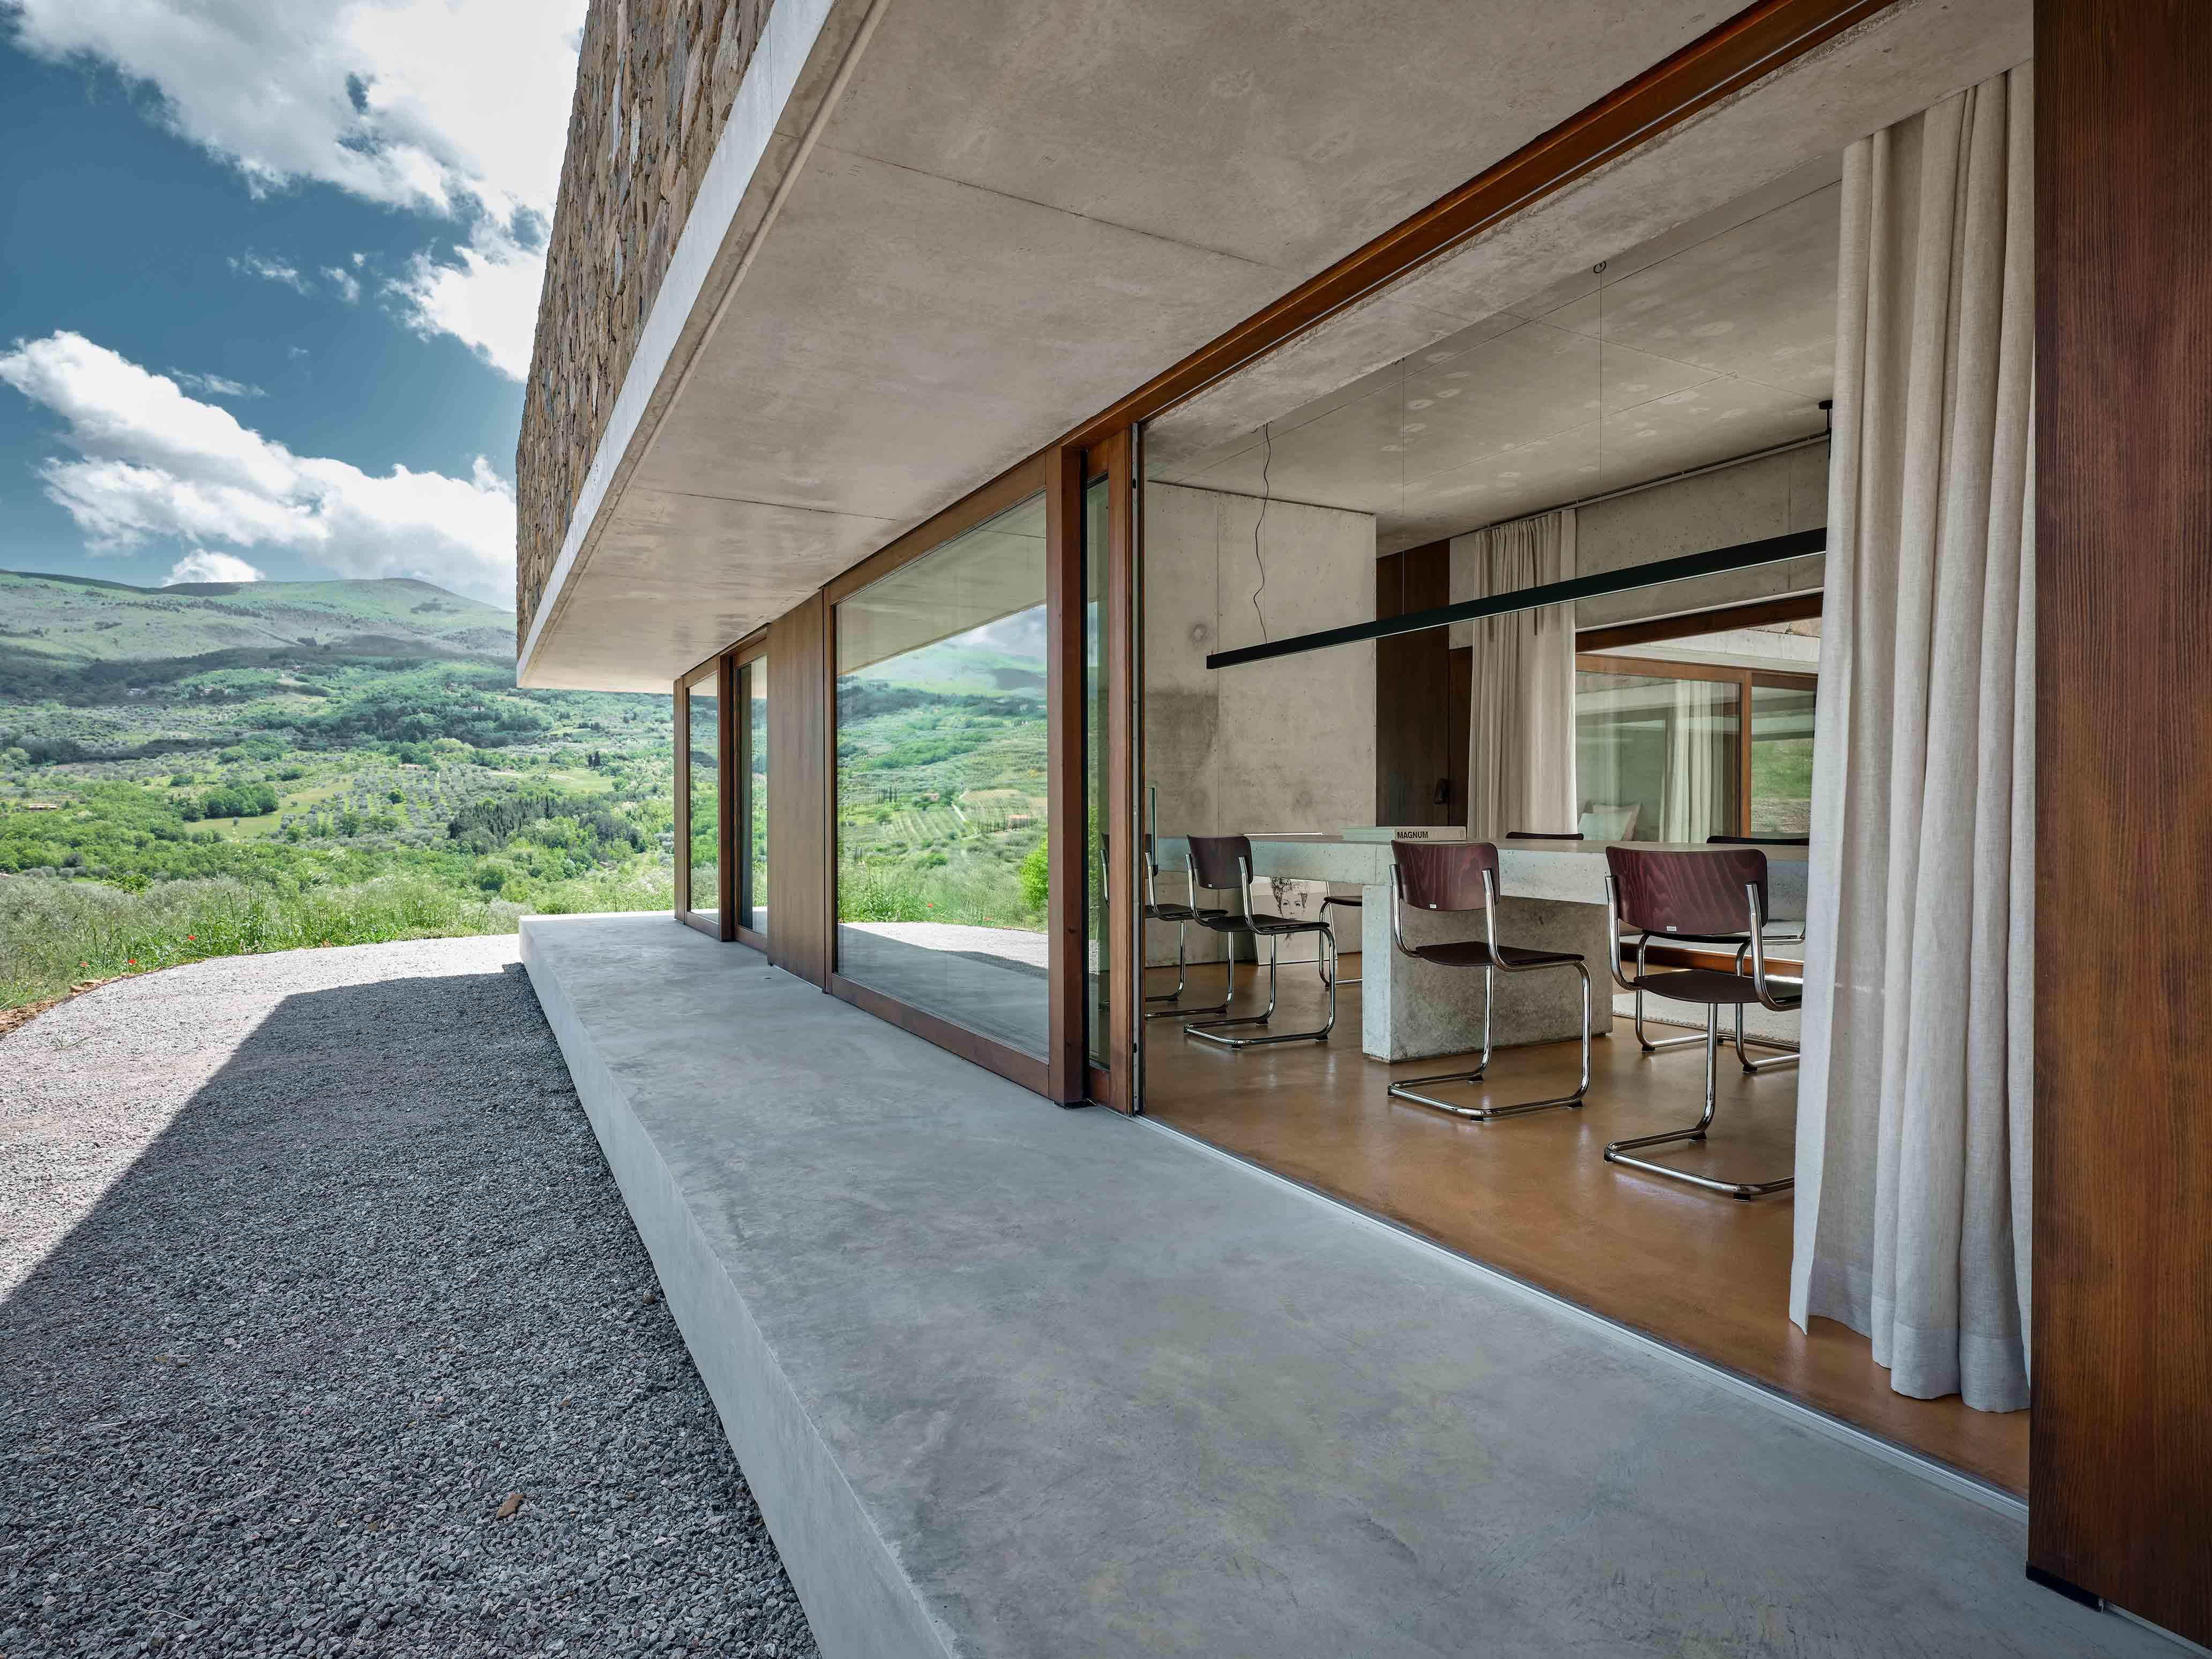 353.a-Gardini-Gibertini-HV-Pavilion-photographed-by-Ezio-Manciucca11.jpg